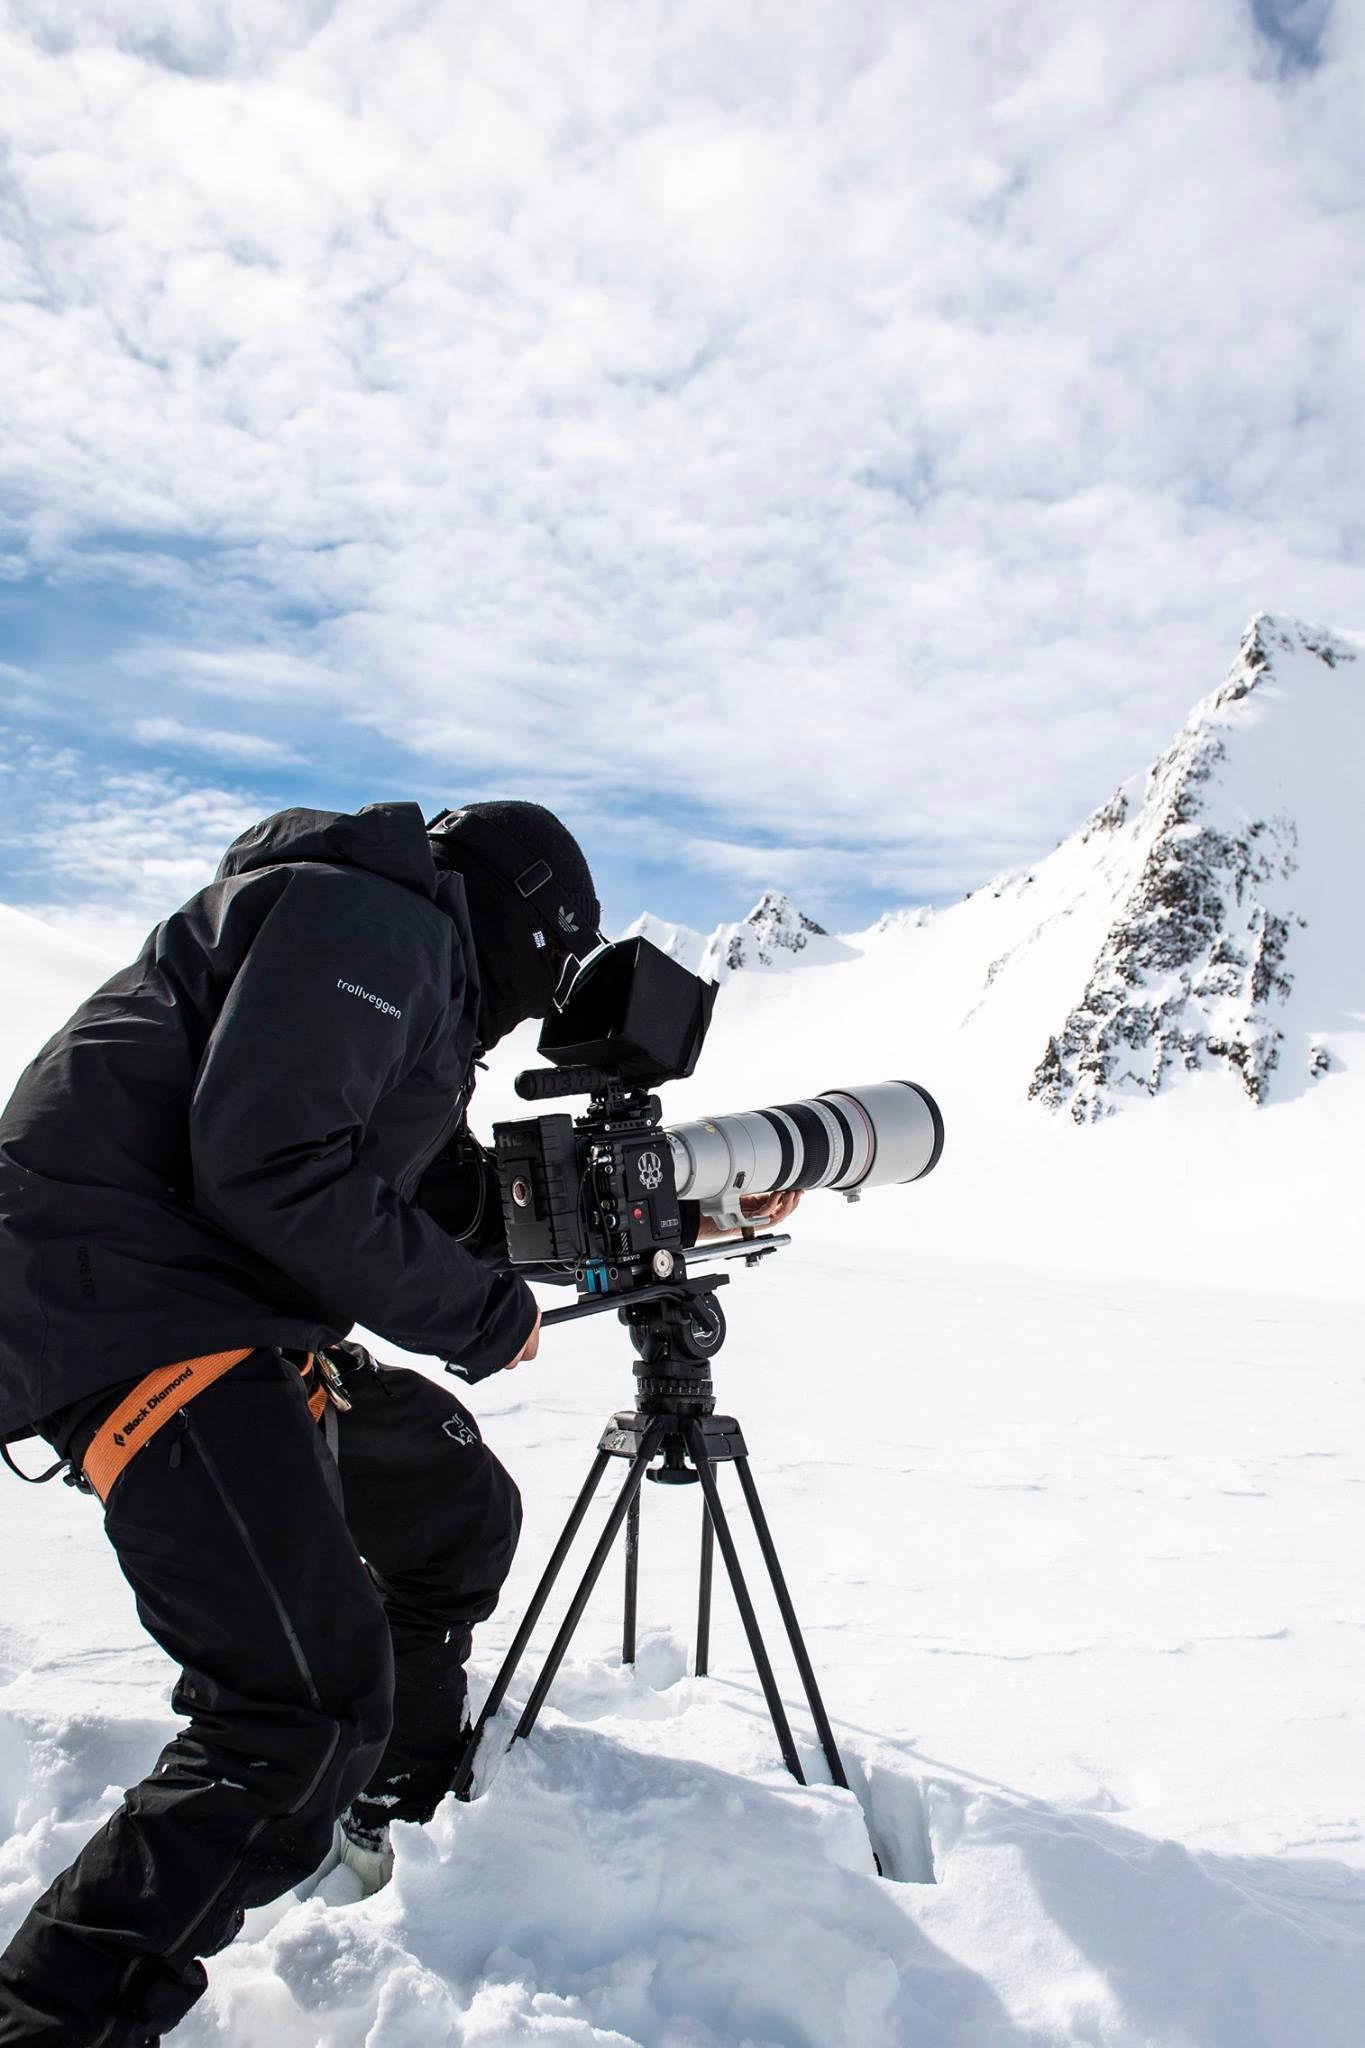 Filmer Michael Haunschmidt mit dem für Alaska Big Mountain Lines notwendigen Equipment - Foto: Pally Learmond